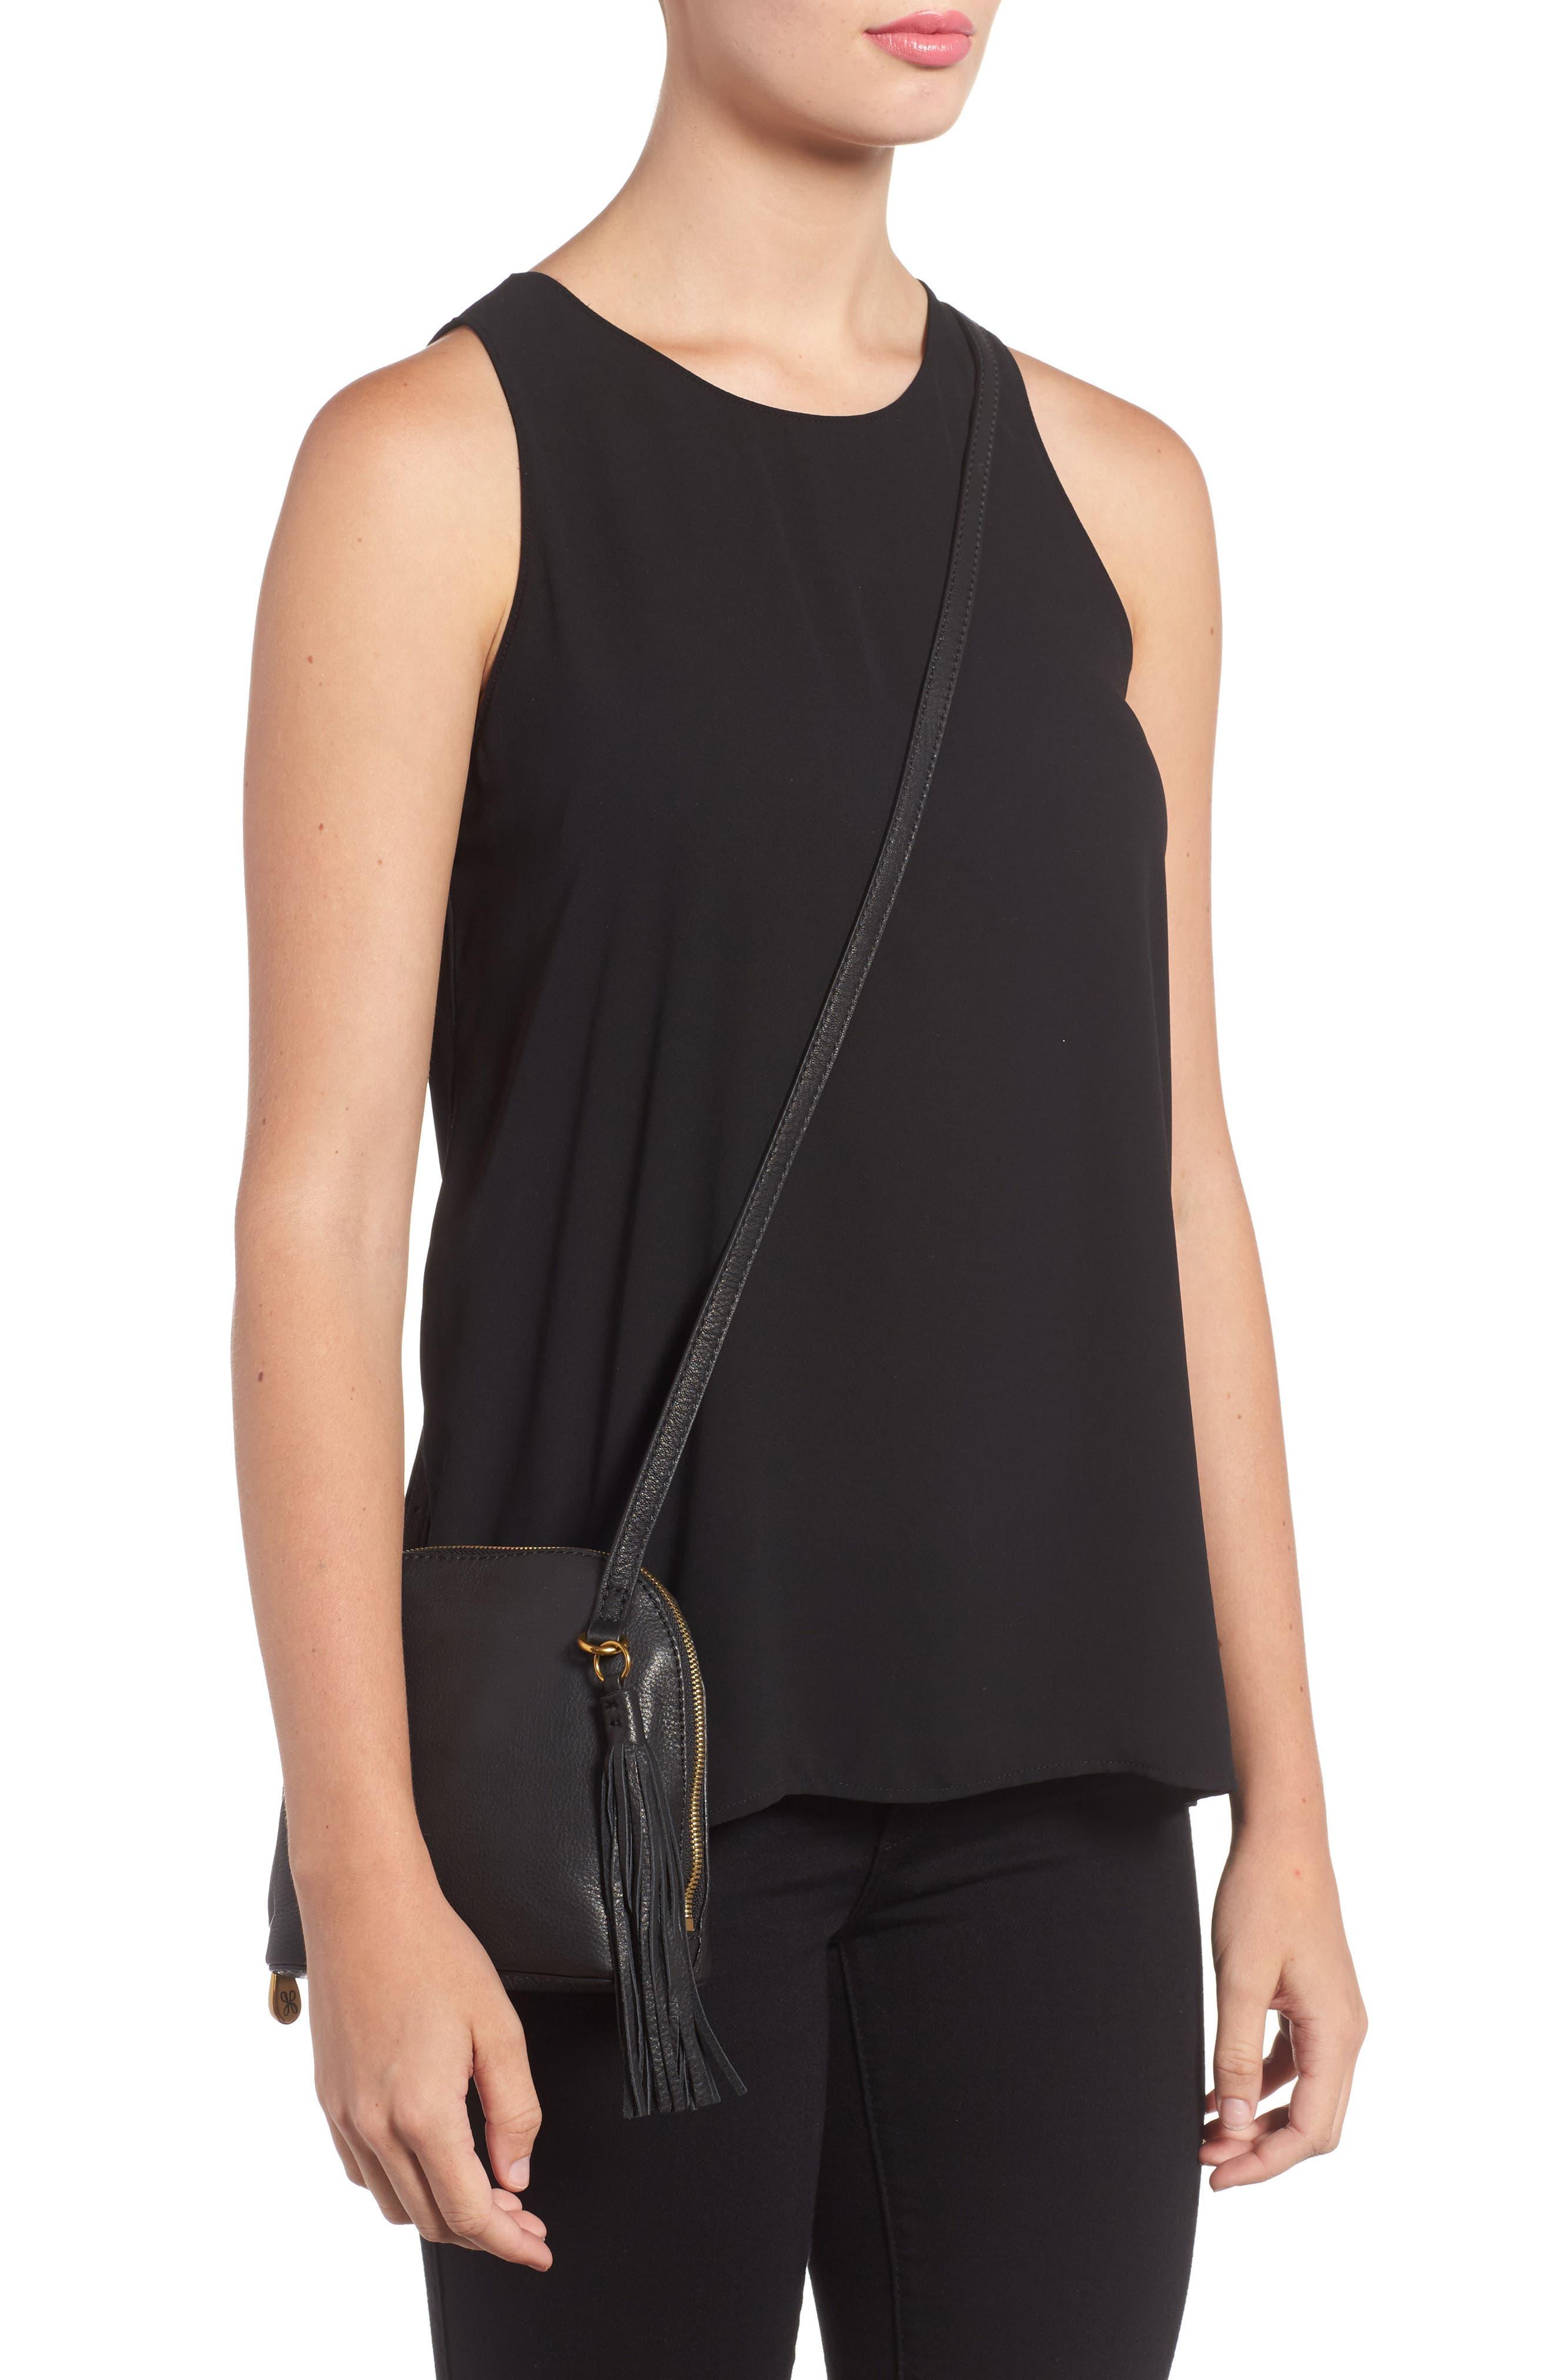 Nash Calfskin Leather Crossbody Bag,                             Alternate thumbnail 2, color,                             Black